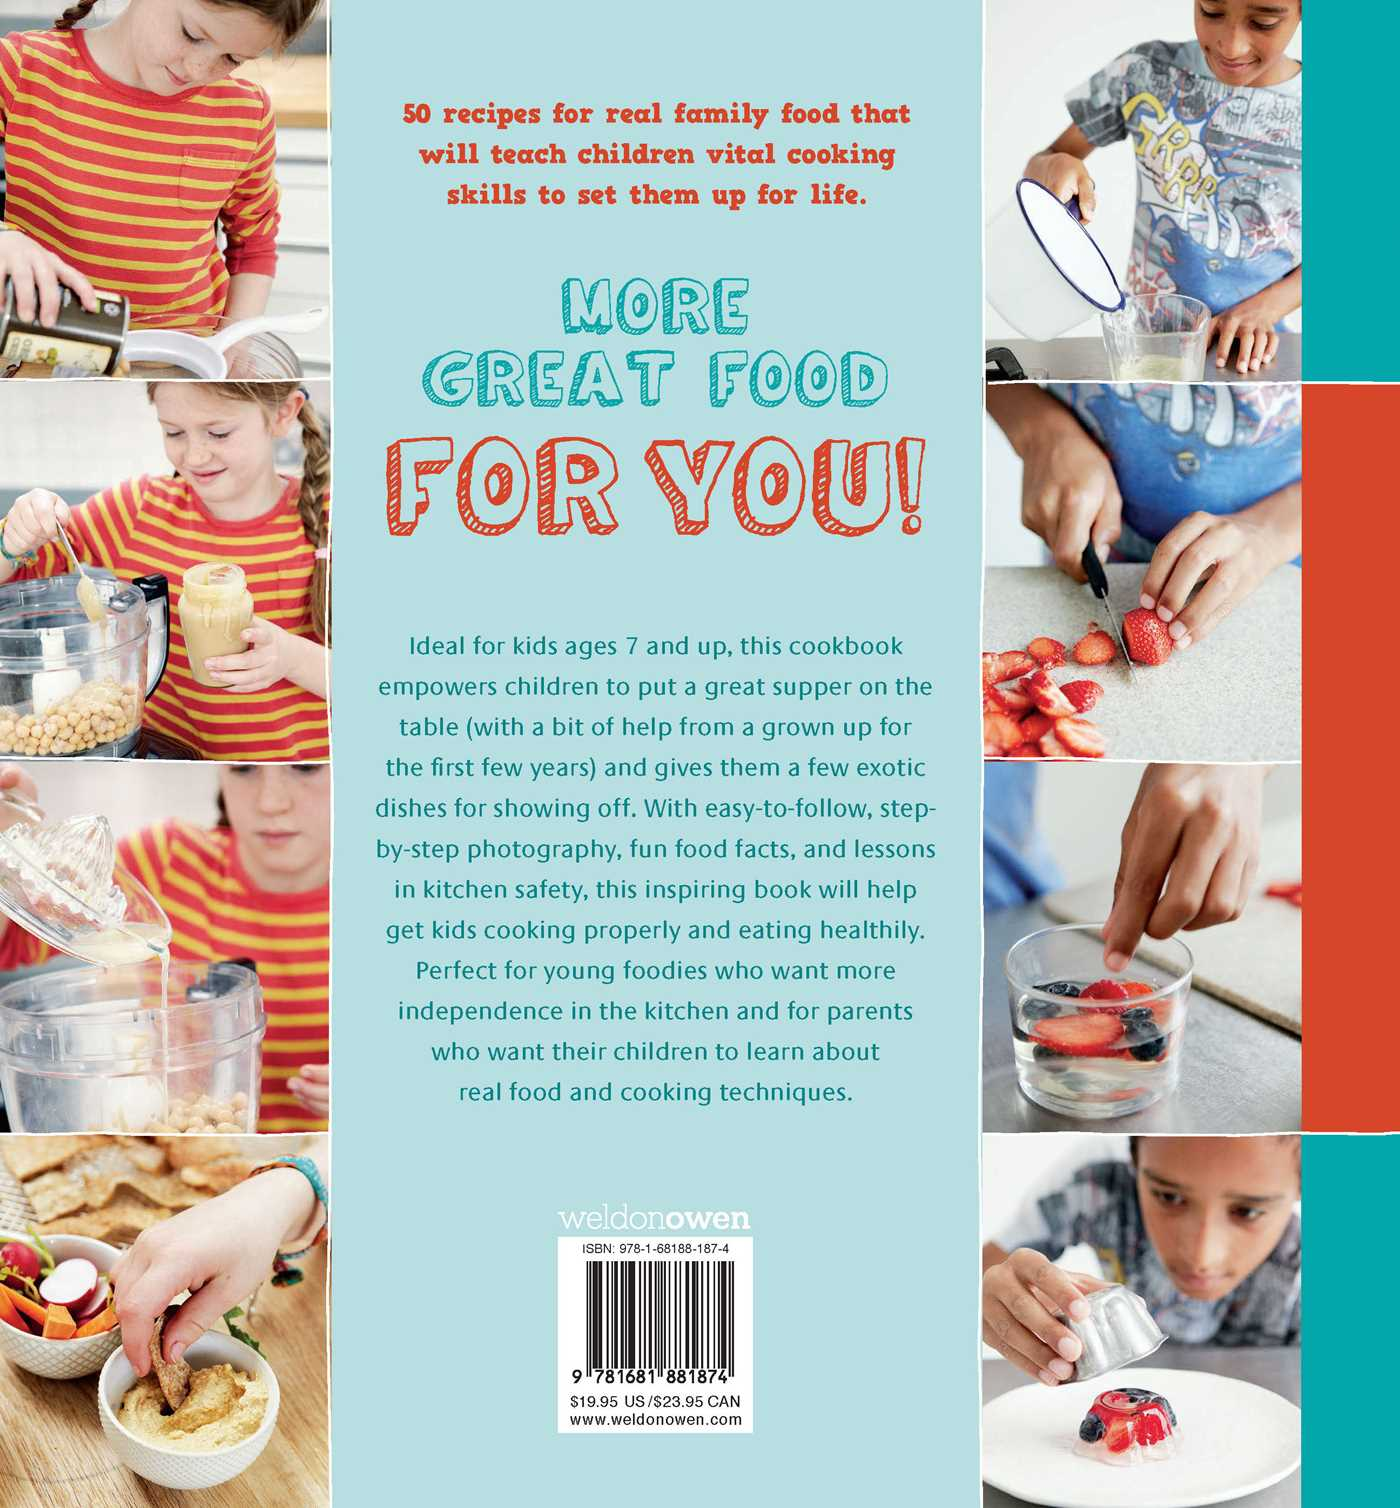 Great food for kids 9781681881874 hr back